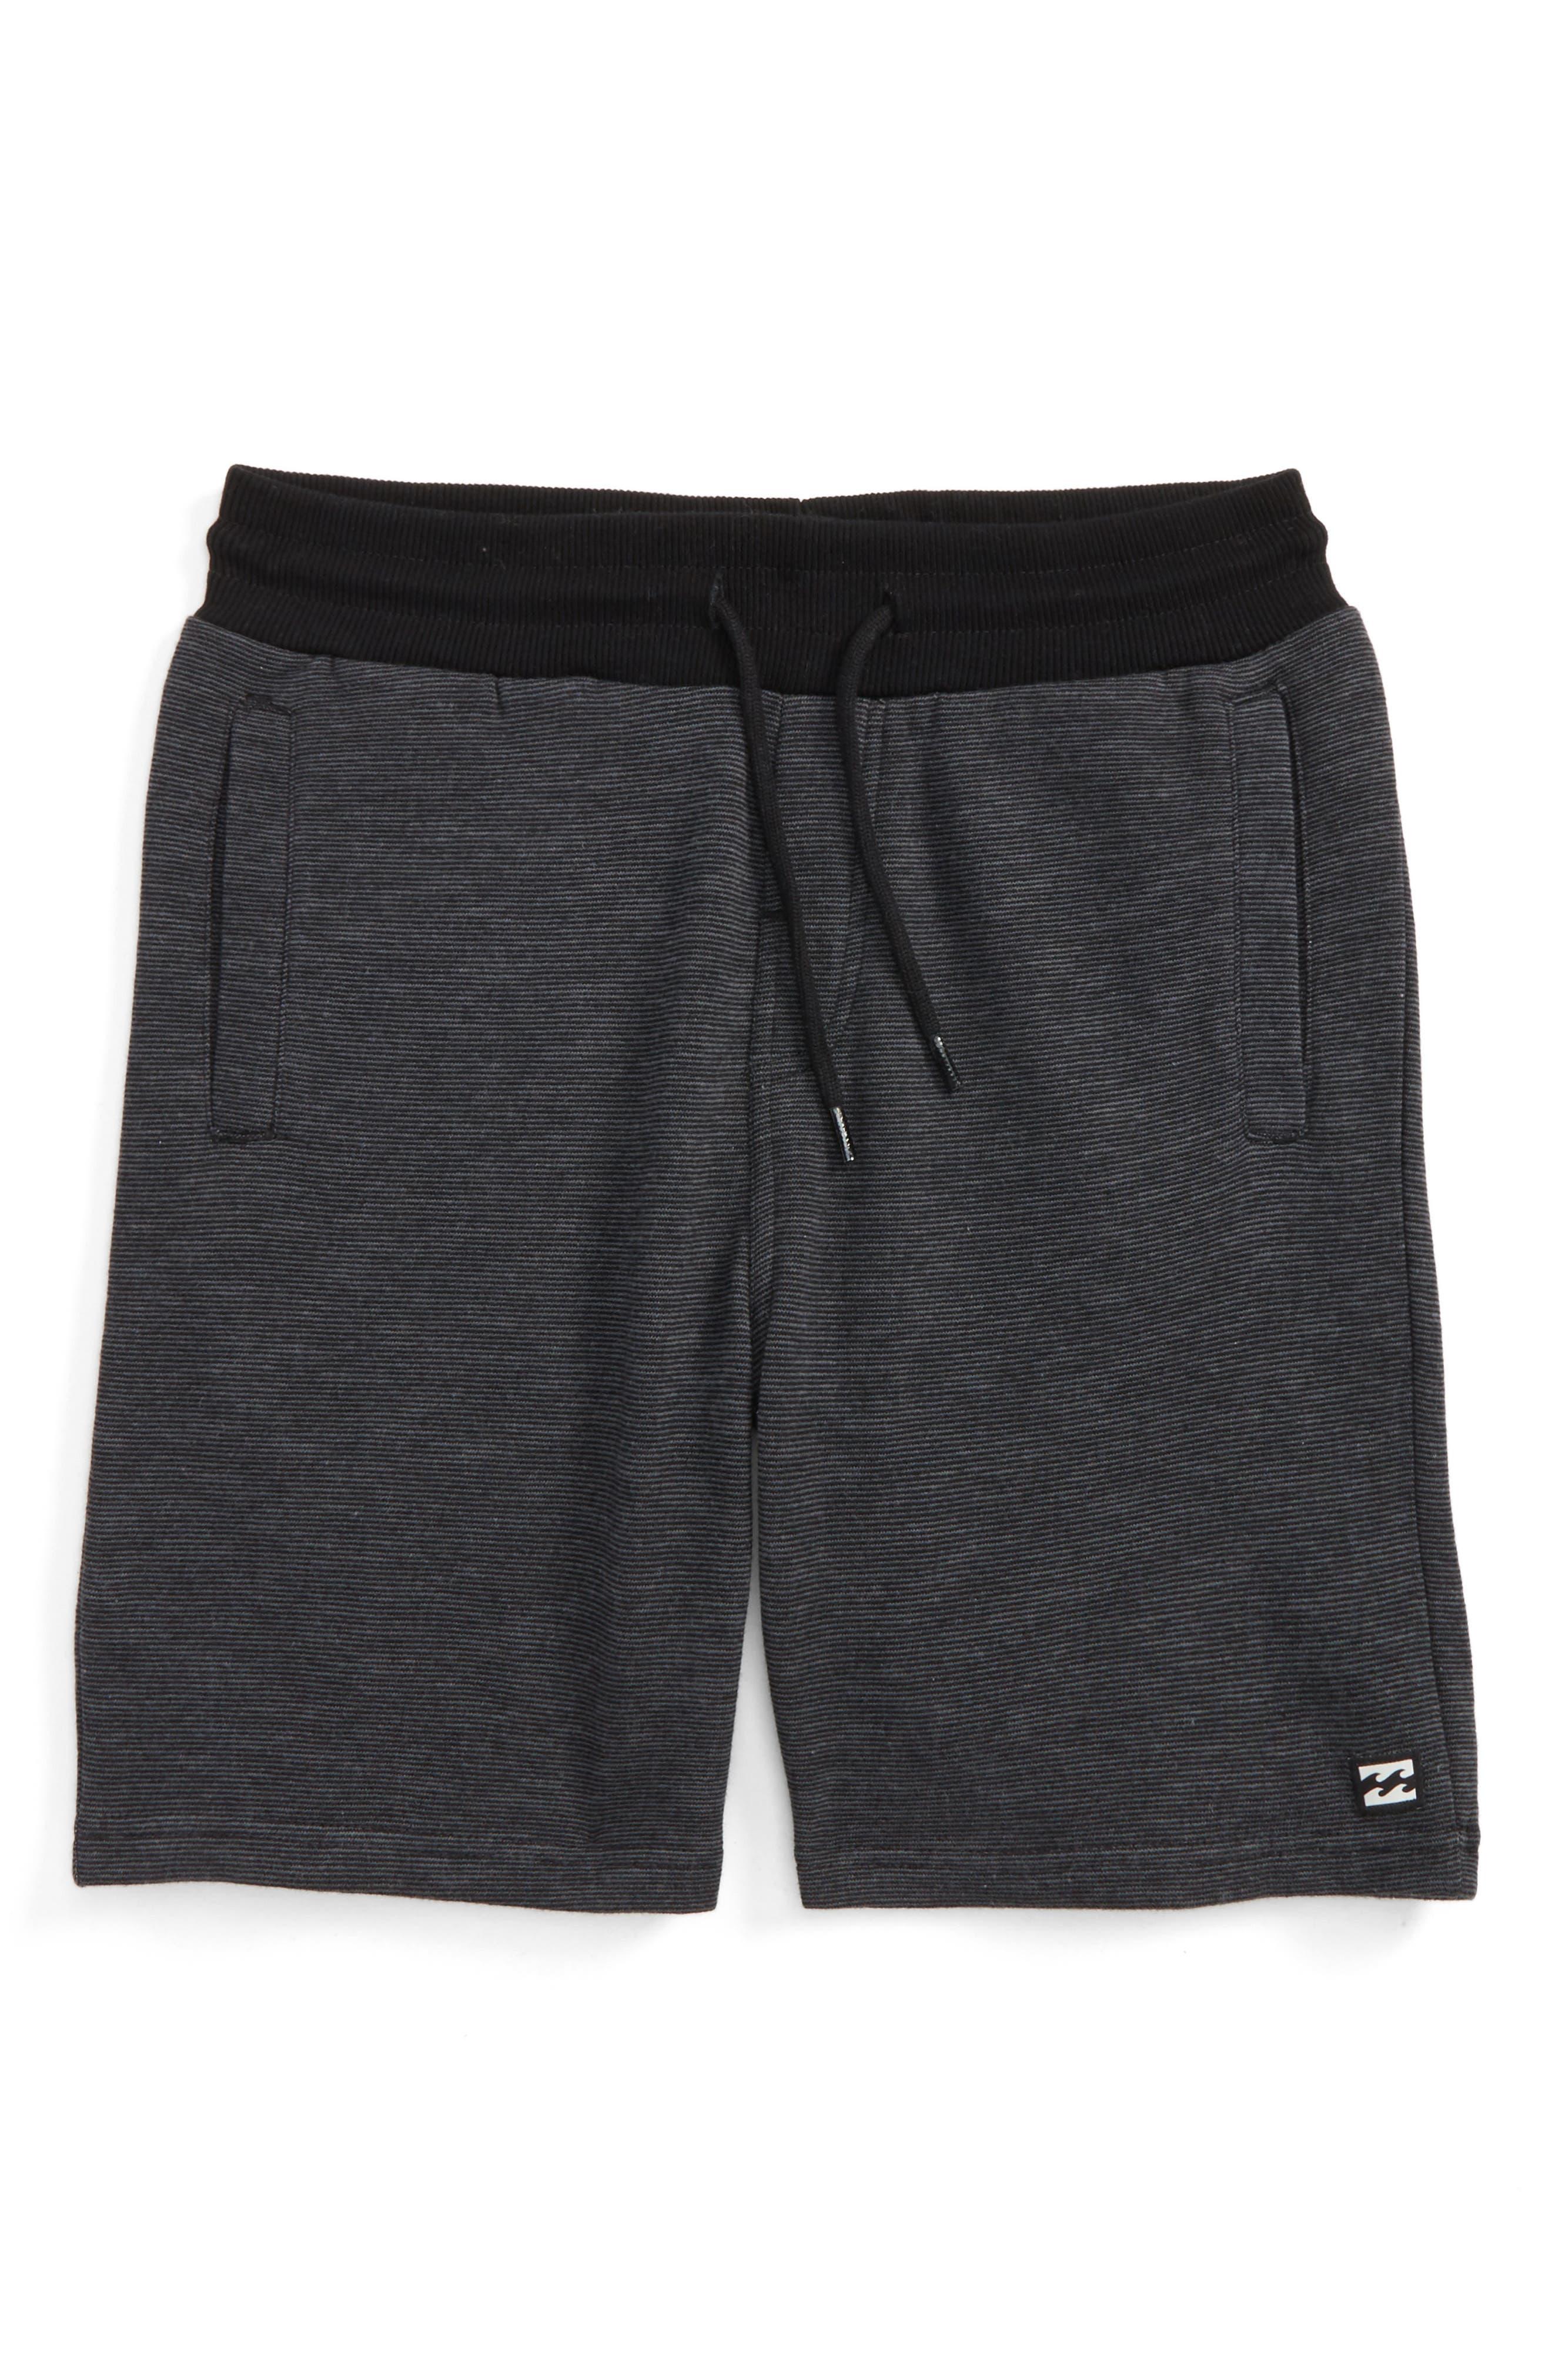 Balance Shorts,                             Main thumbnail 1, color,                             Black Heather